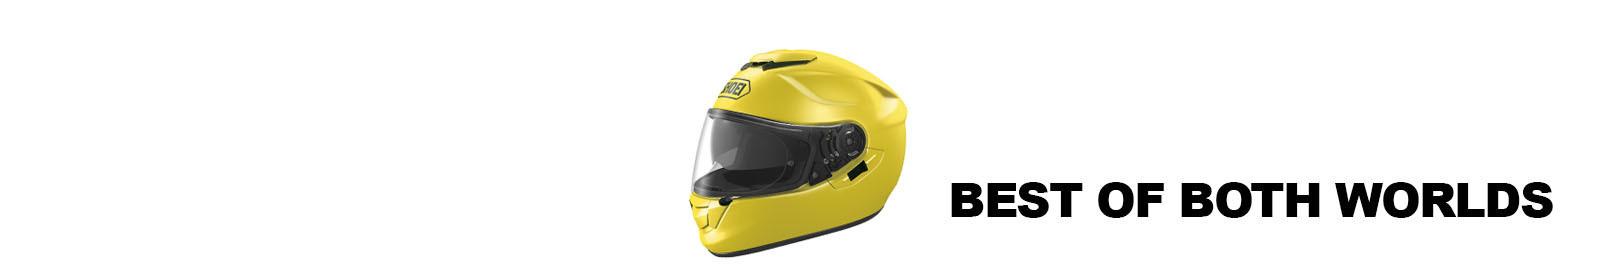 Shoei GT-AIR Helmets